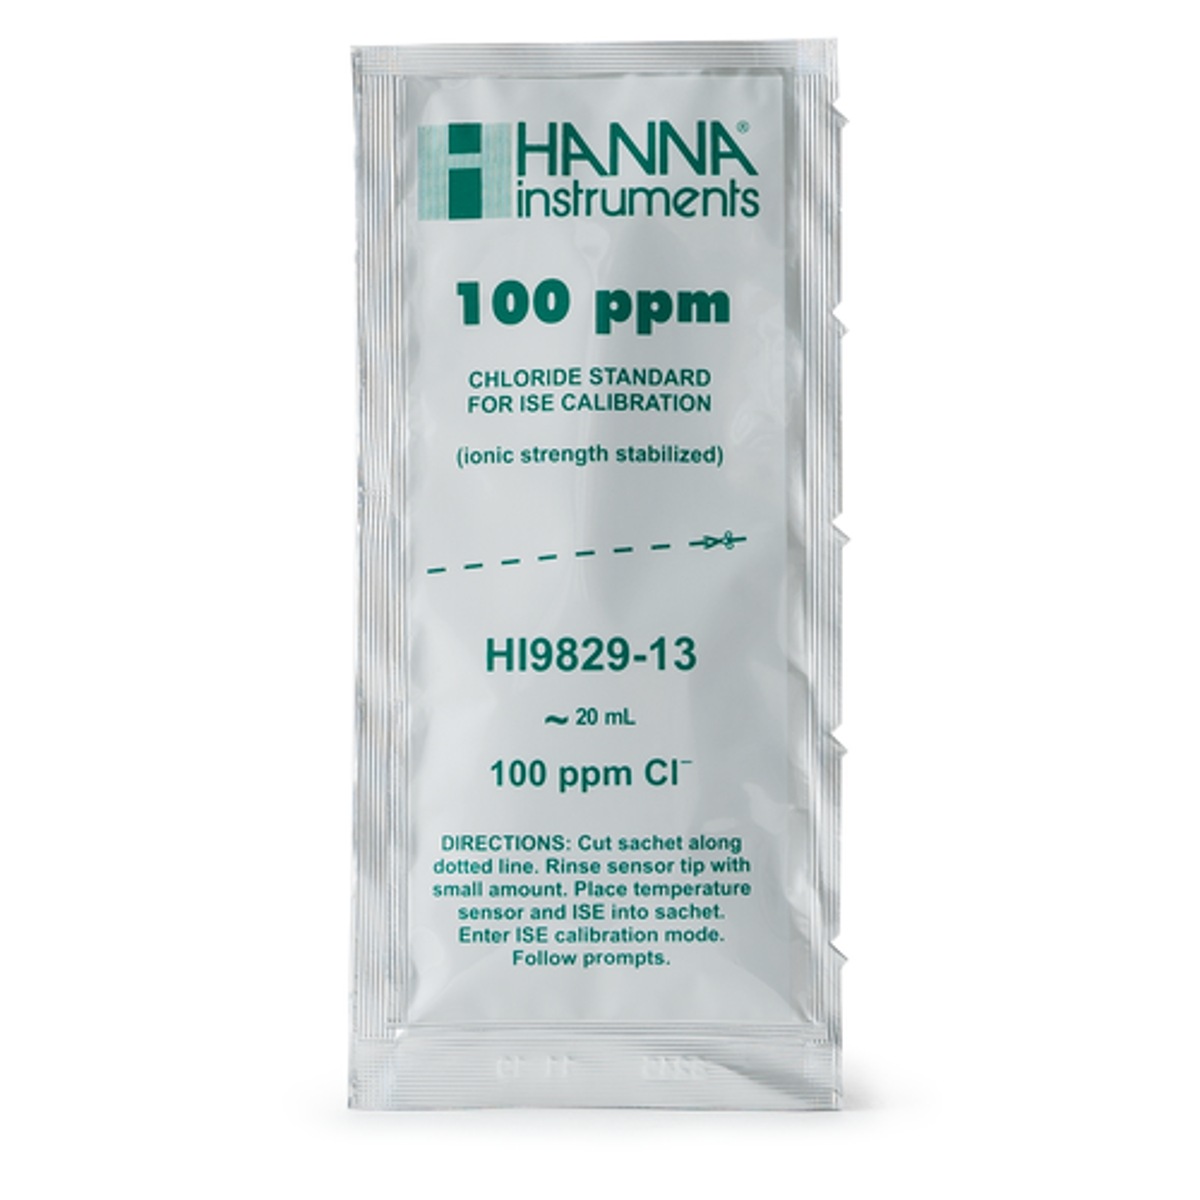 100 ppm Chloride Calibration Standard Sachets for HI9829 (25 x 25 mL) - HI9829-13